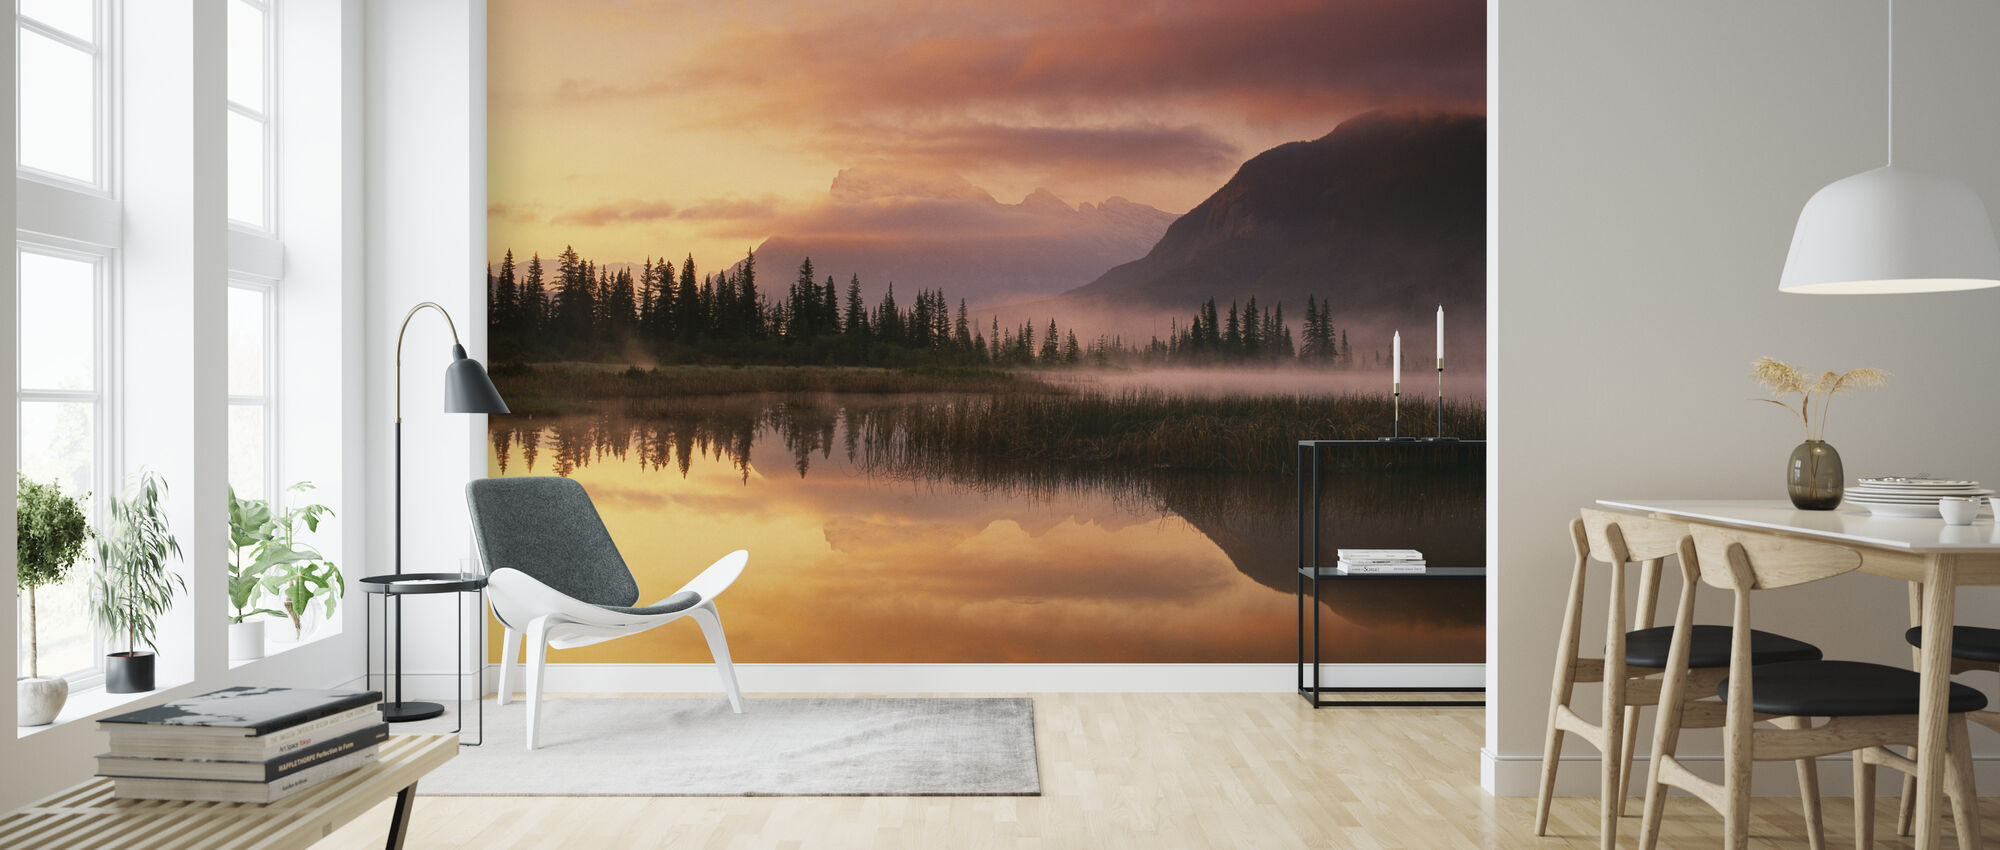 Orange Reflection - Wallpaper - Living Room